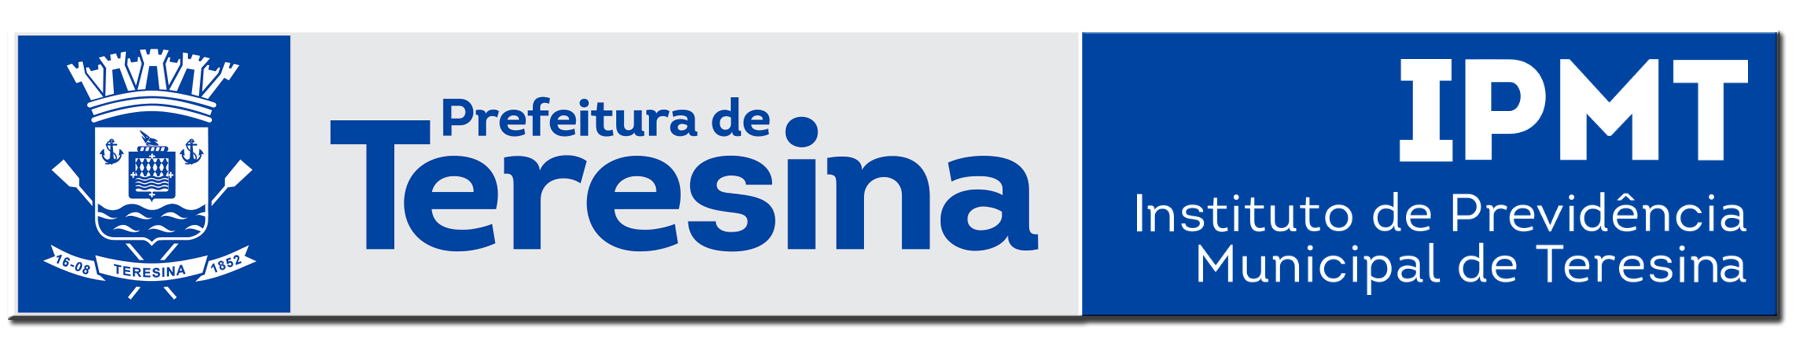 IPMT | Instituto de Previdência Municipal de Teresina